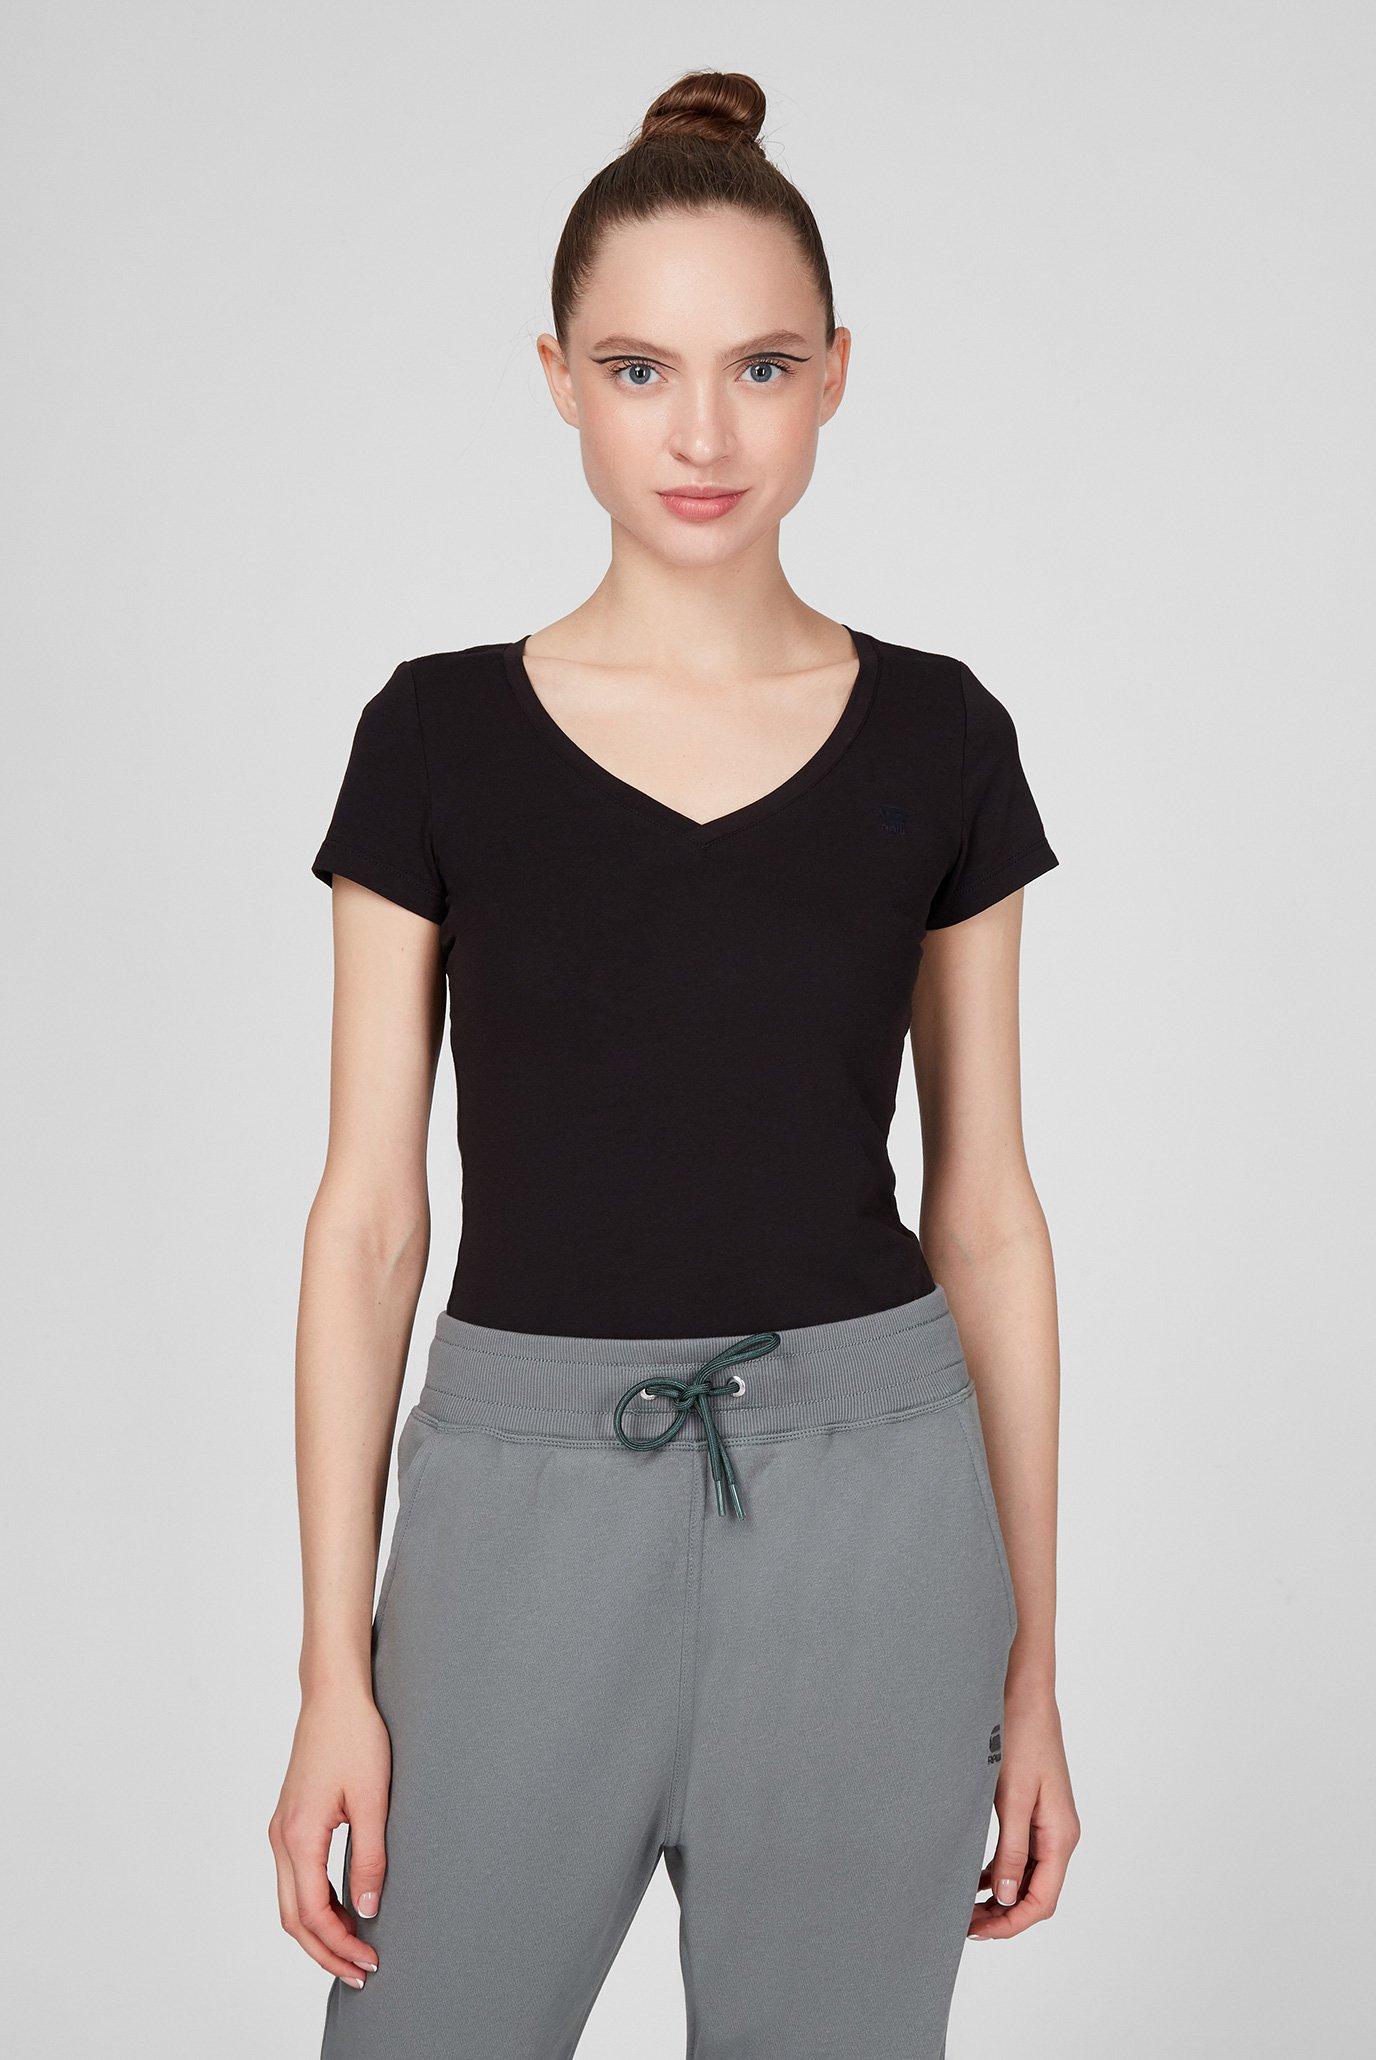 Женская черная футболка Base v t wmn cap sl 1